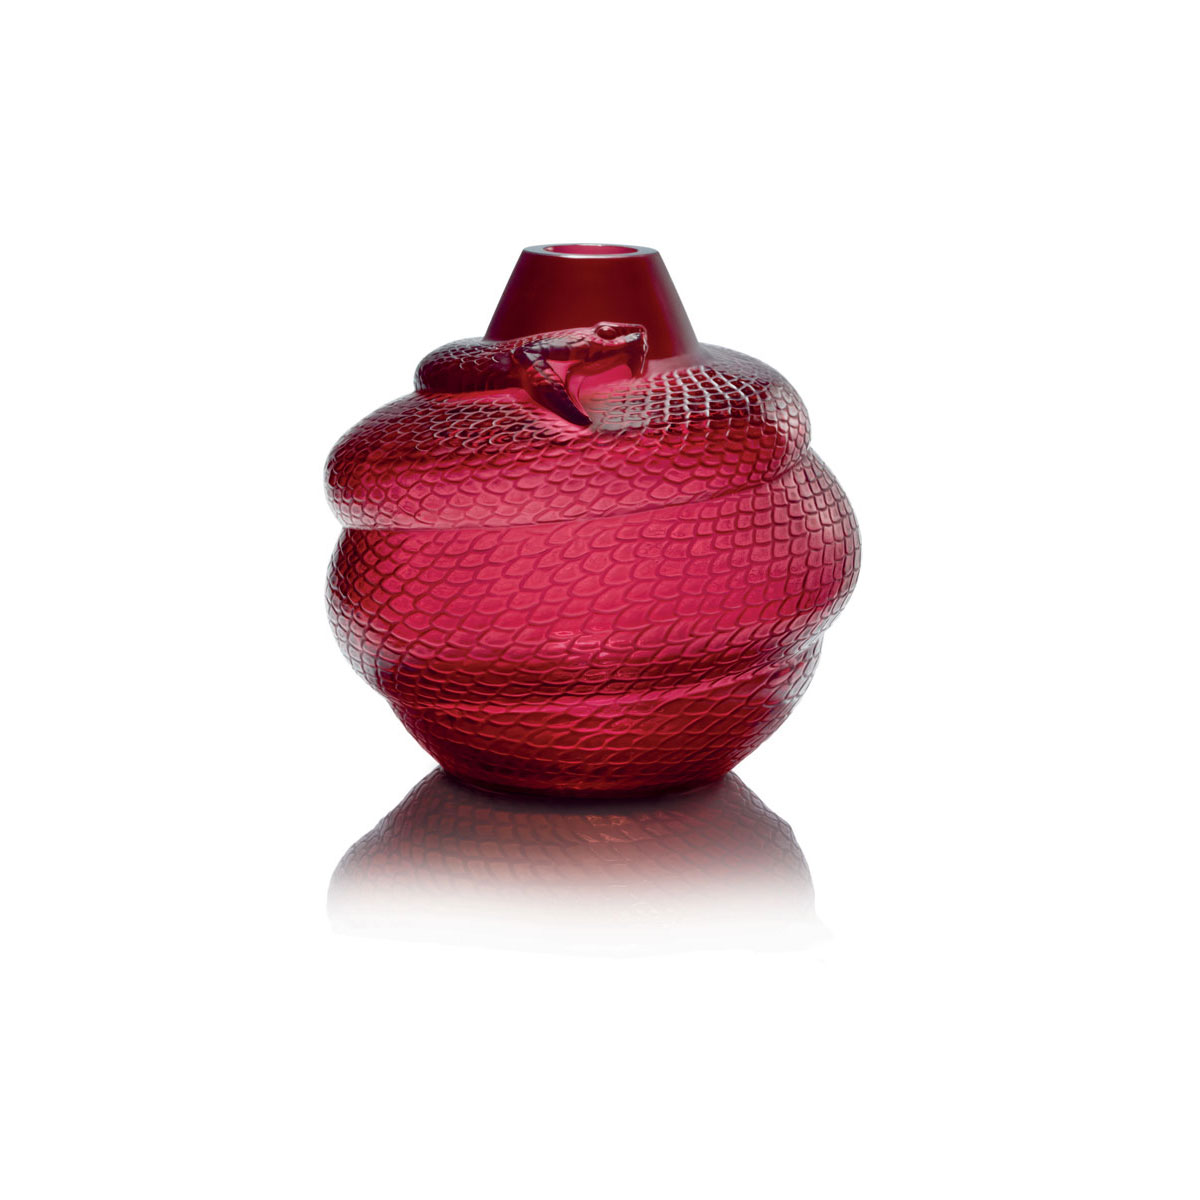 "Lalique Crystal, Red Serpent 9"" Crystal Vase"